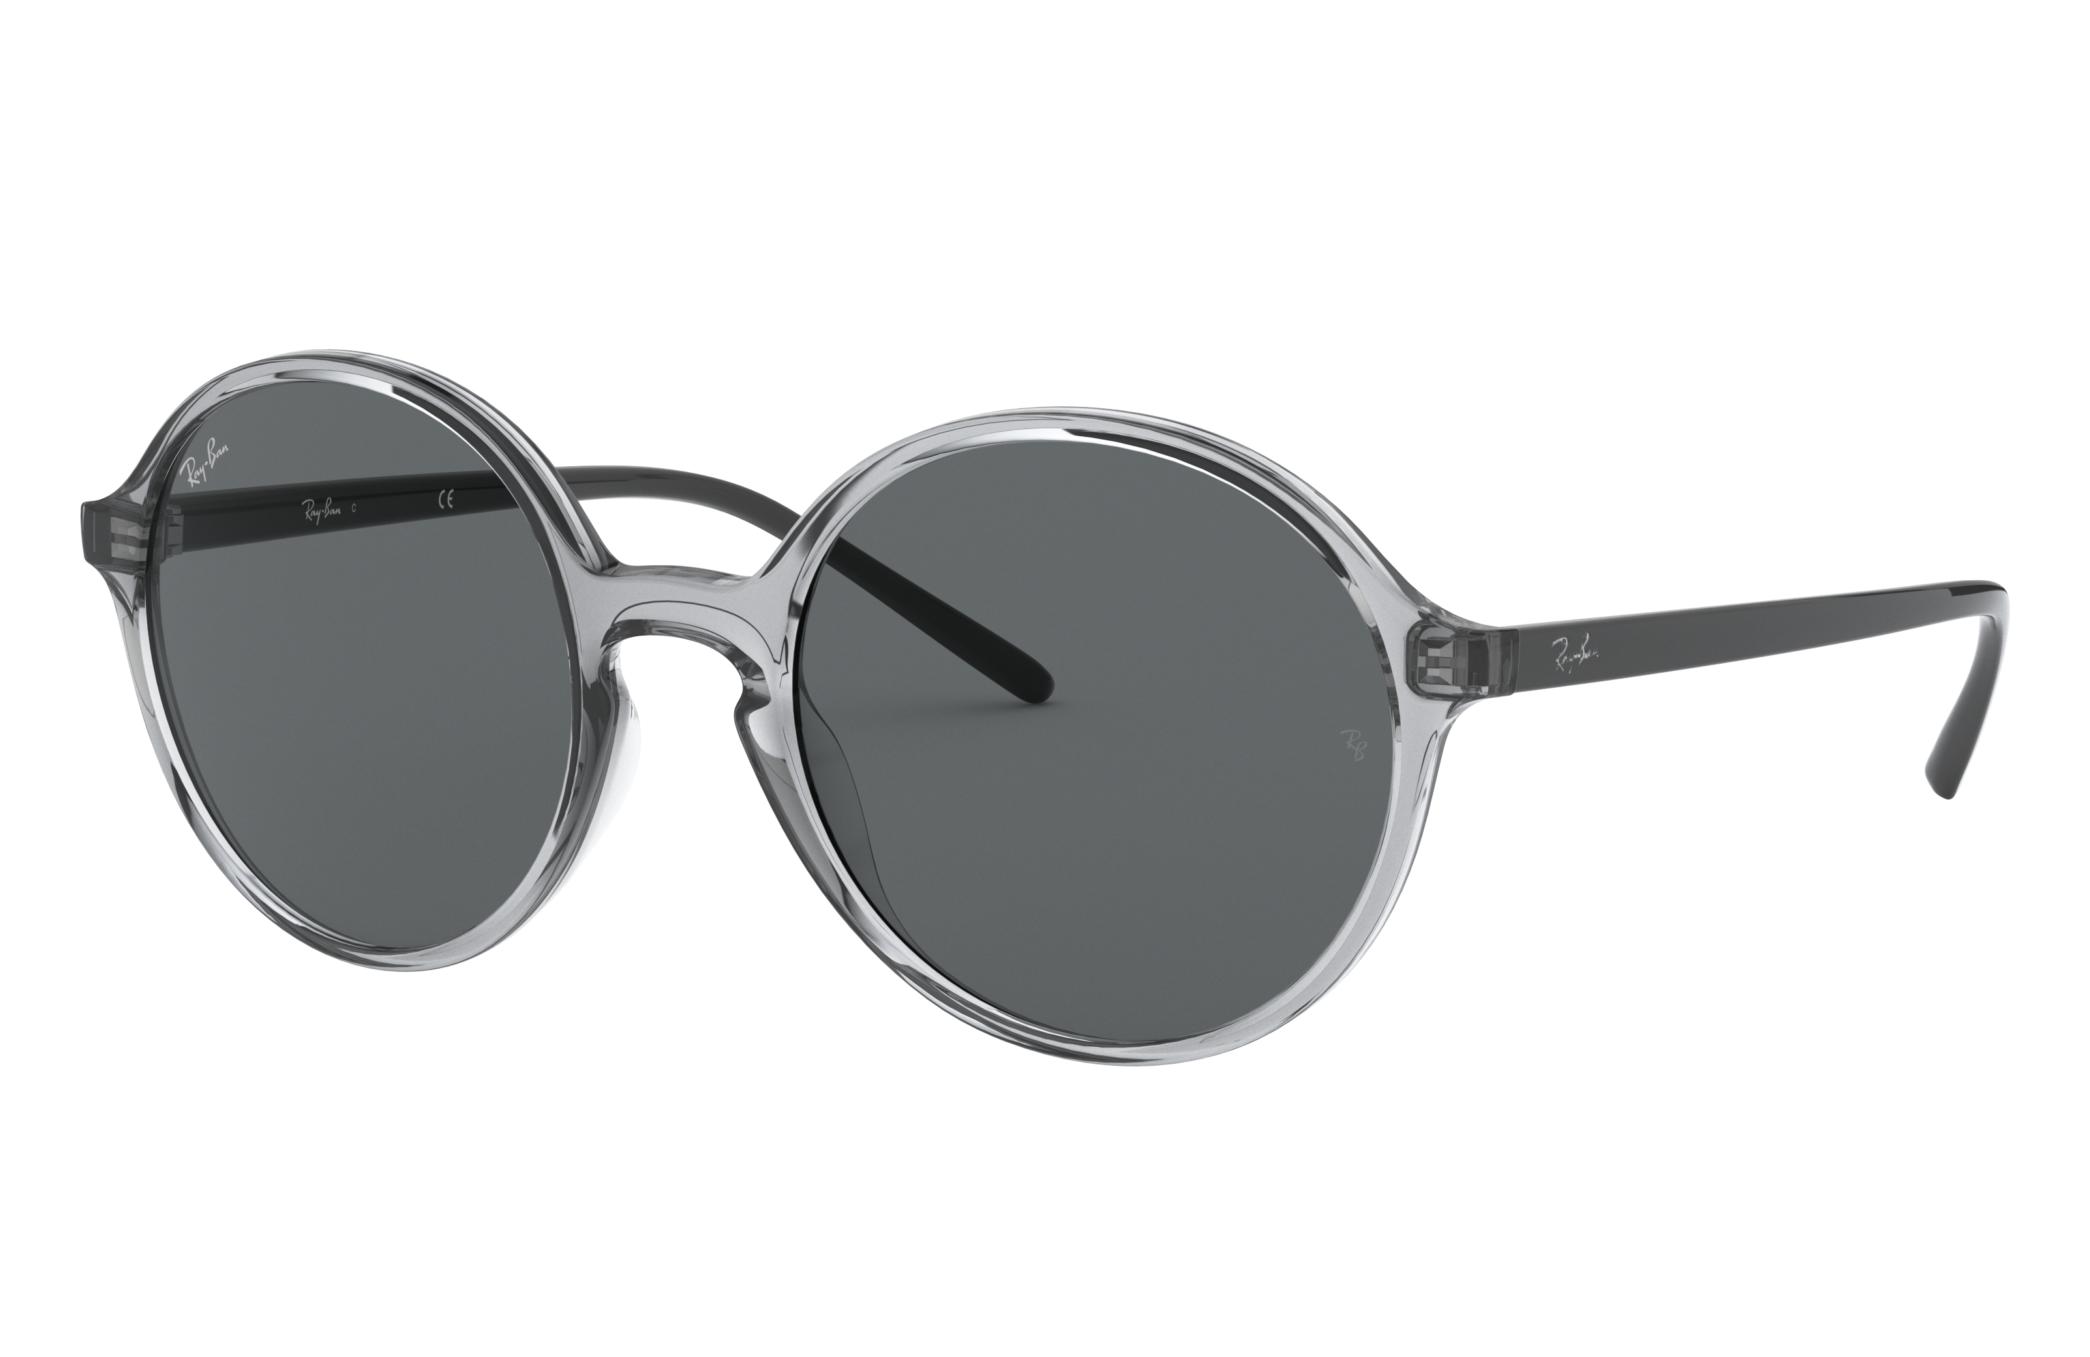 Ray-Ban Rb4304 Low Bridge Fit Grey, Gray Lenses - RB4304F